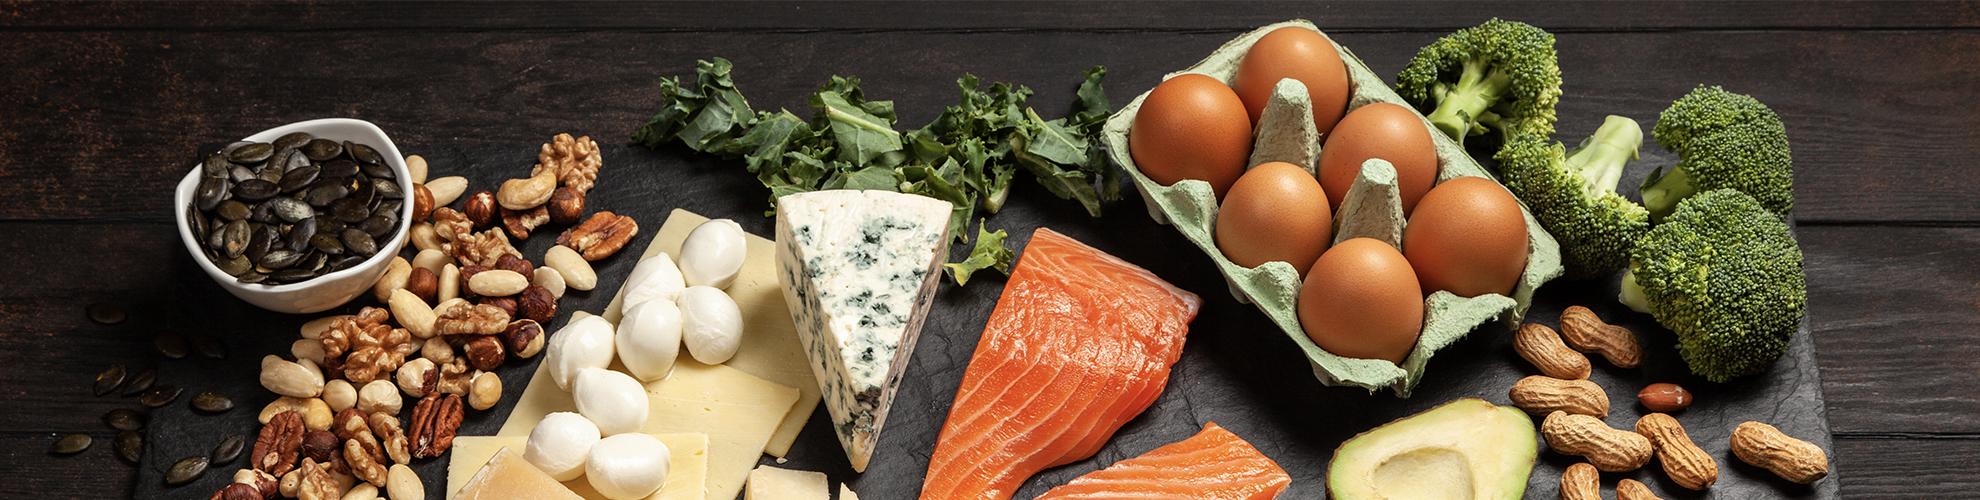 Ketogenic Foods on Black Slate Cutting Board